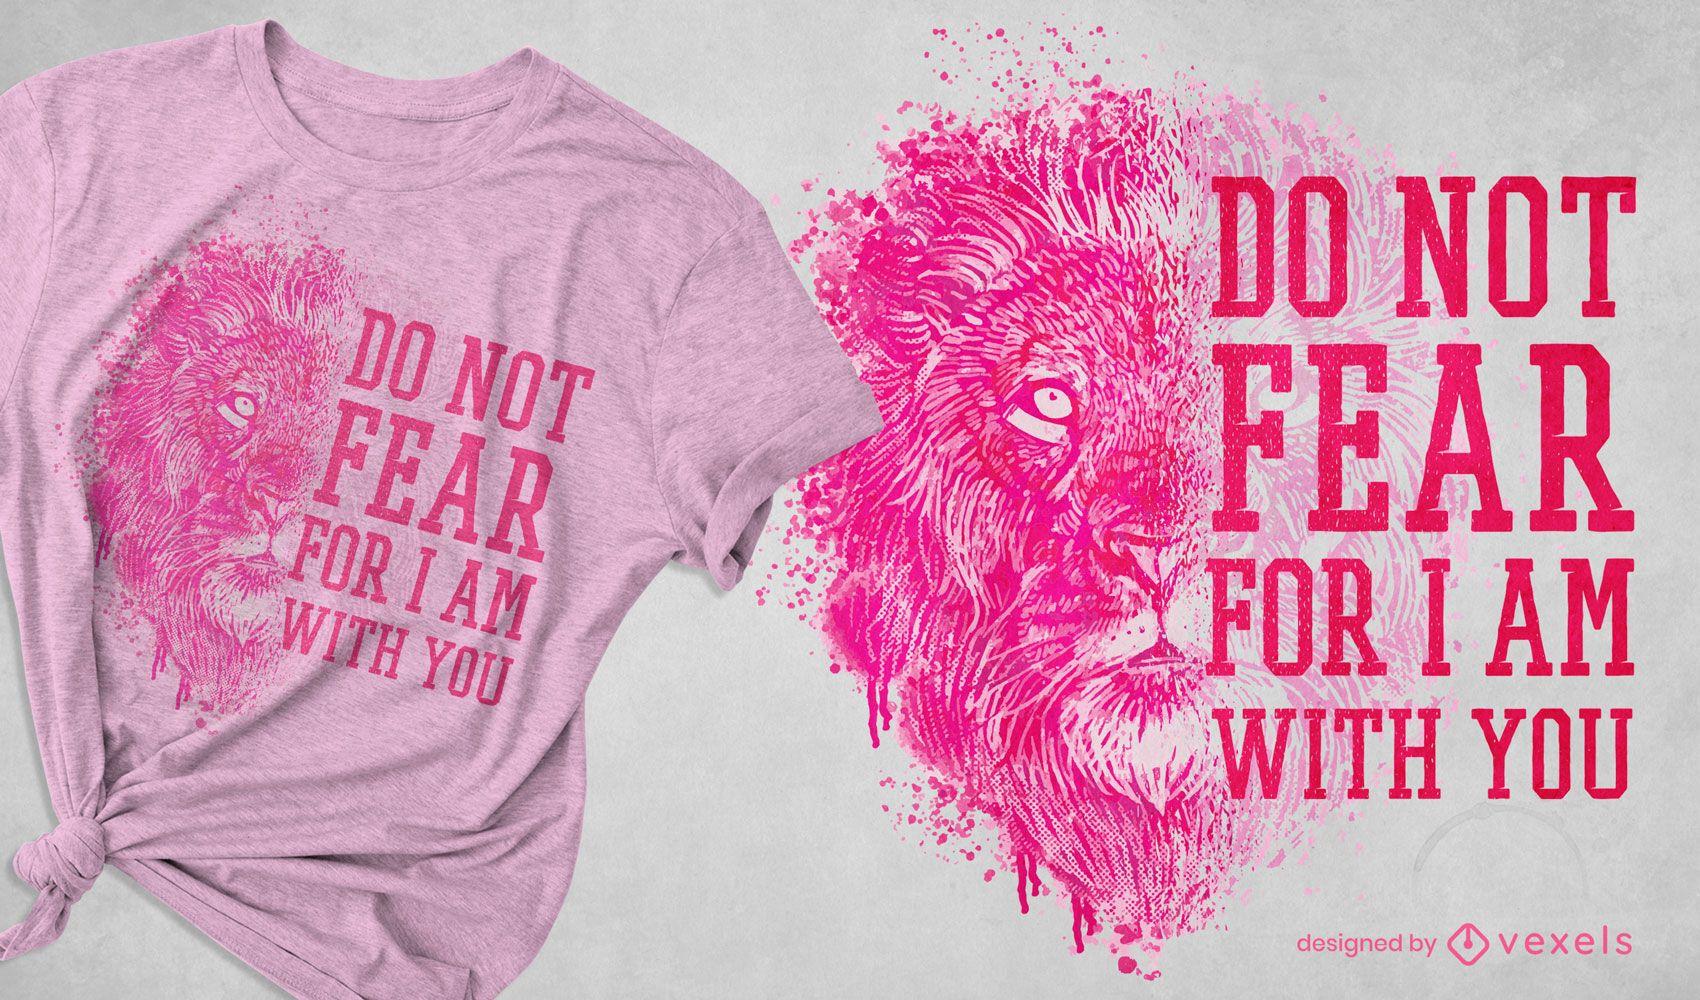 Realistic lion wild t-shirt design